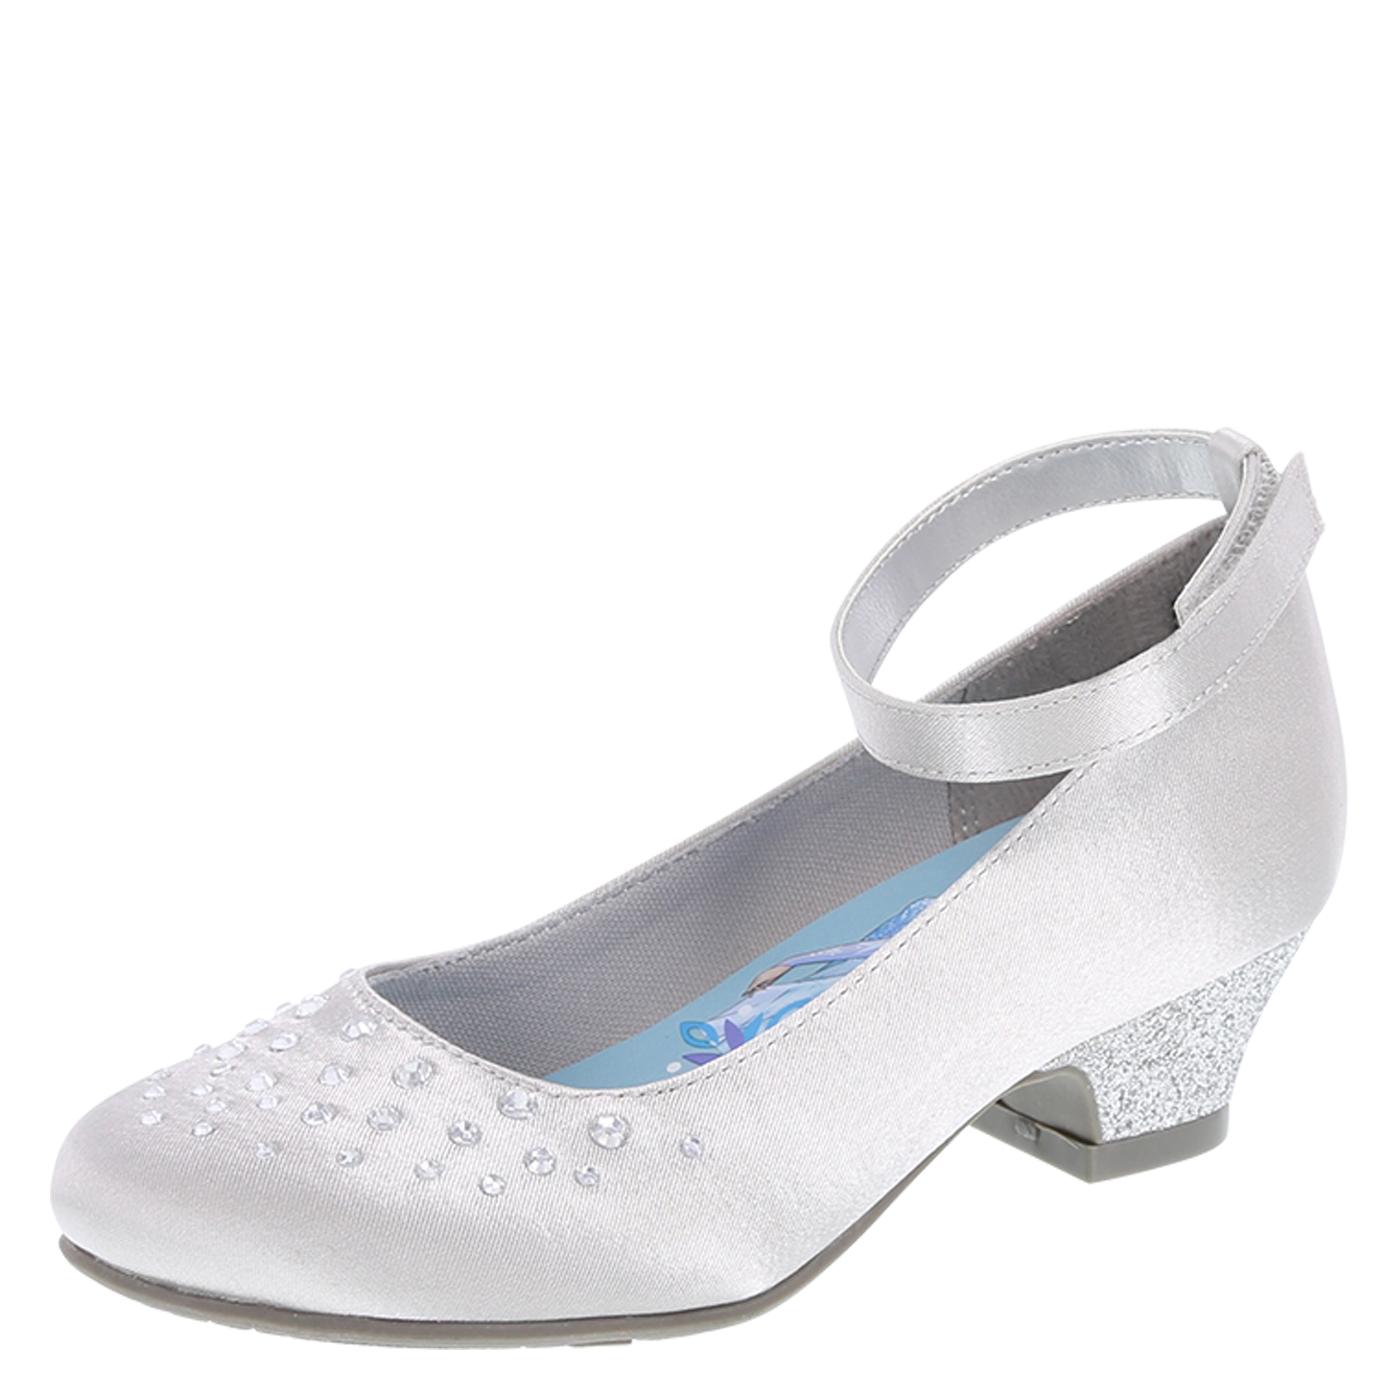 silver dress shoes girlsu0027 satin dress shoes, silver vmmuwbd